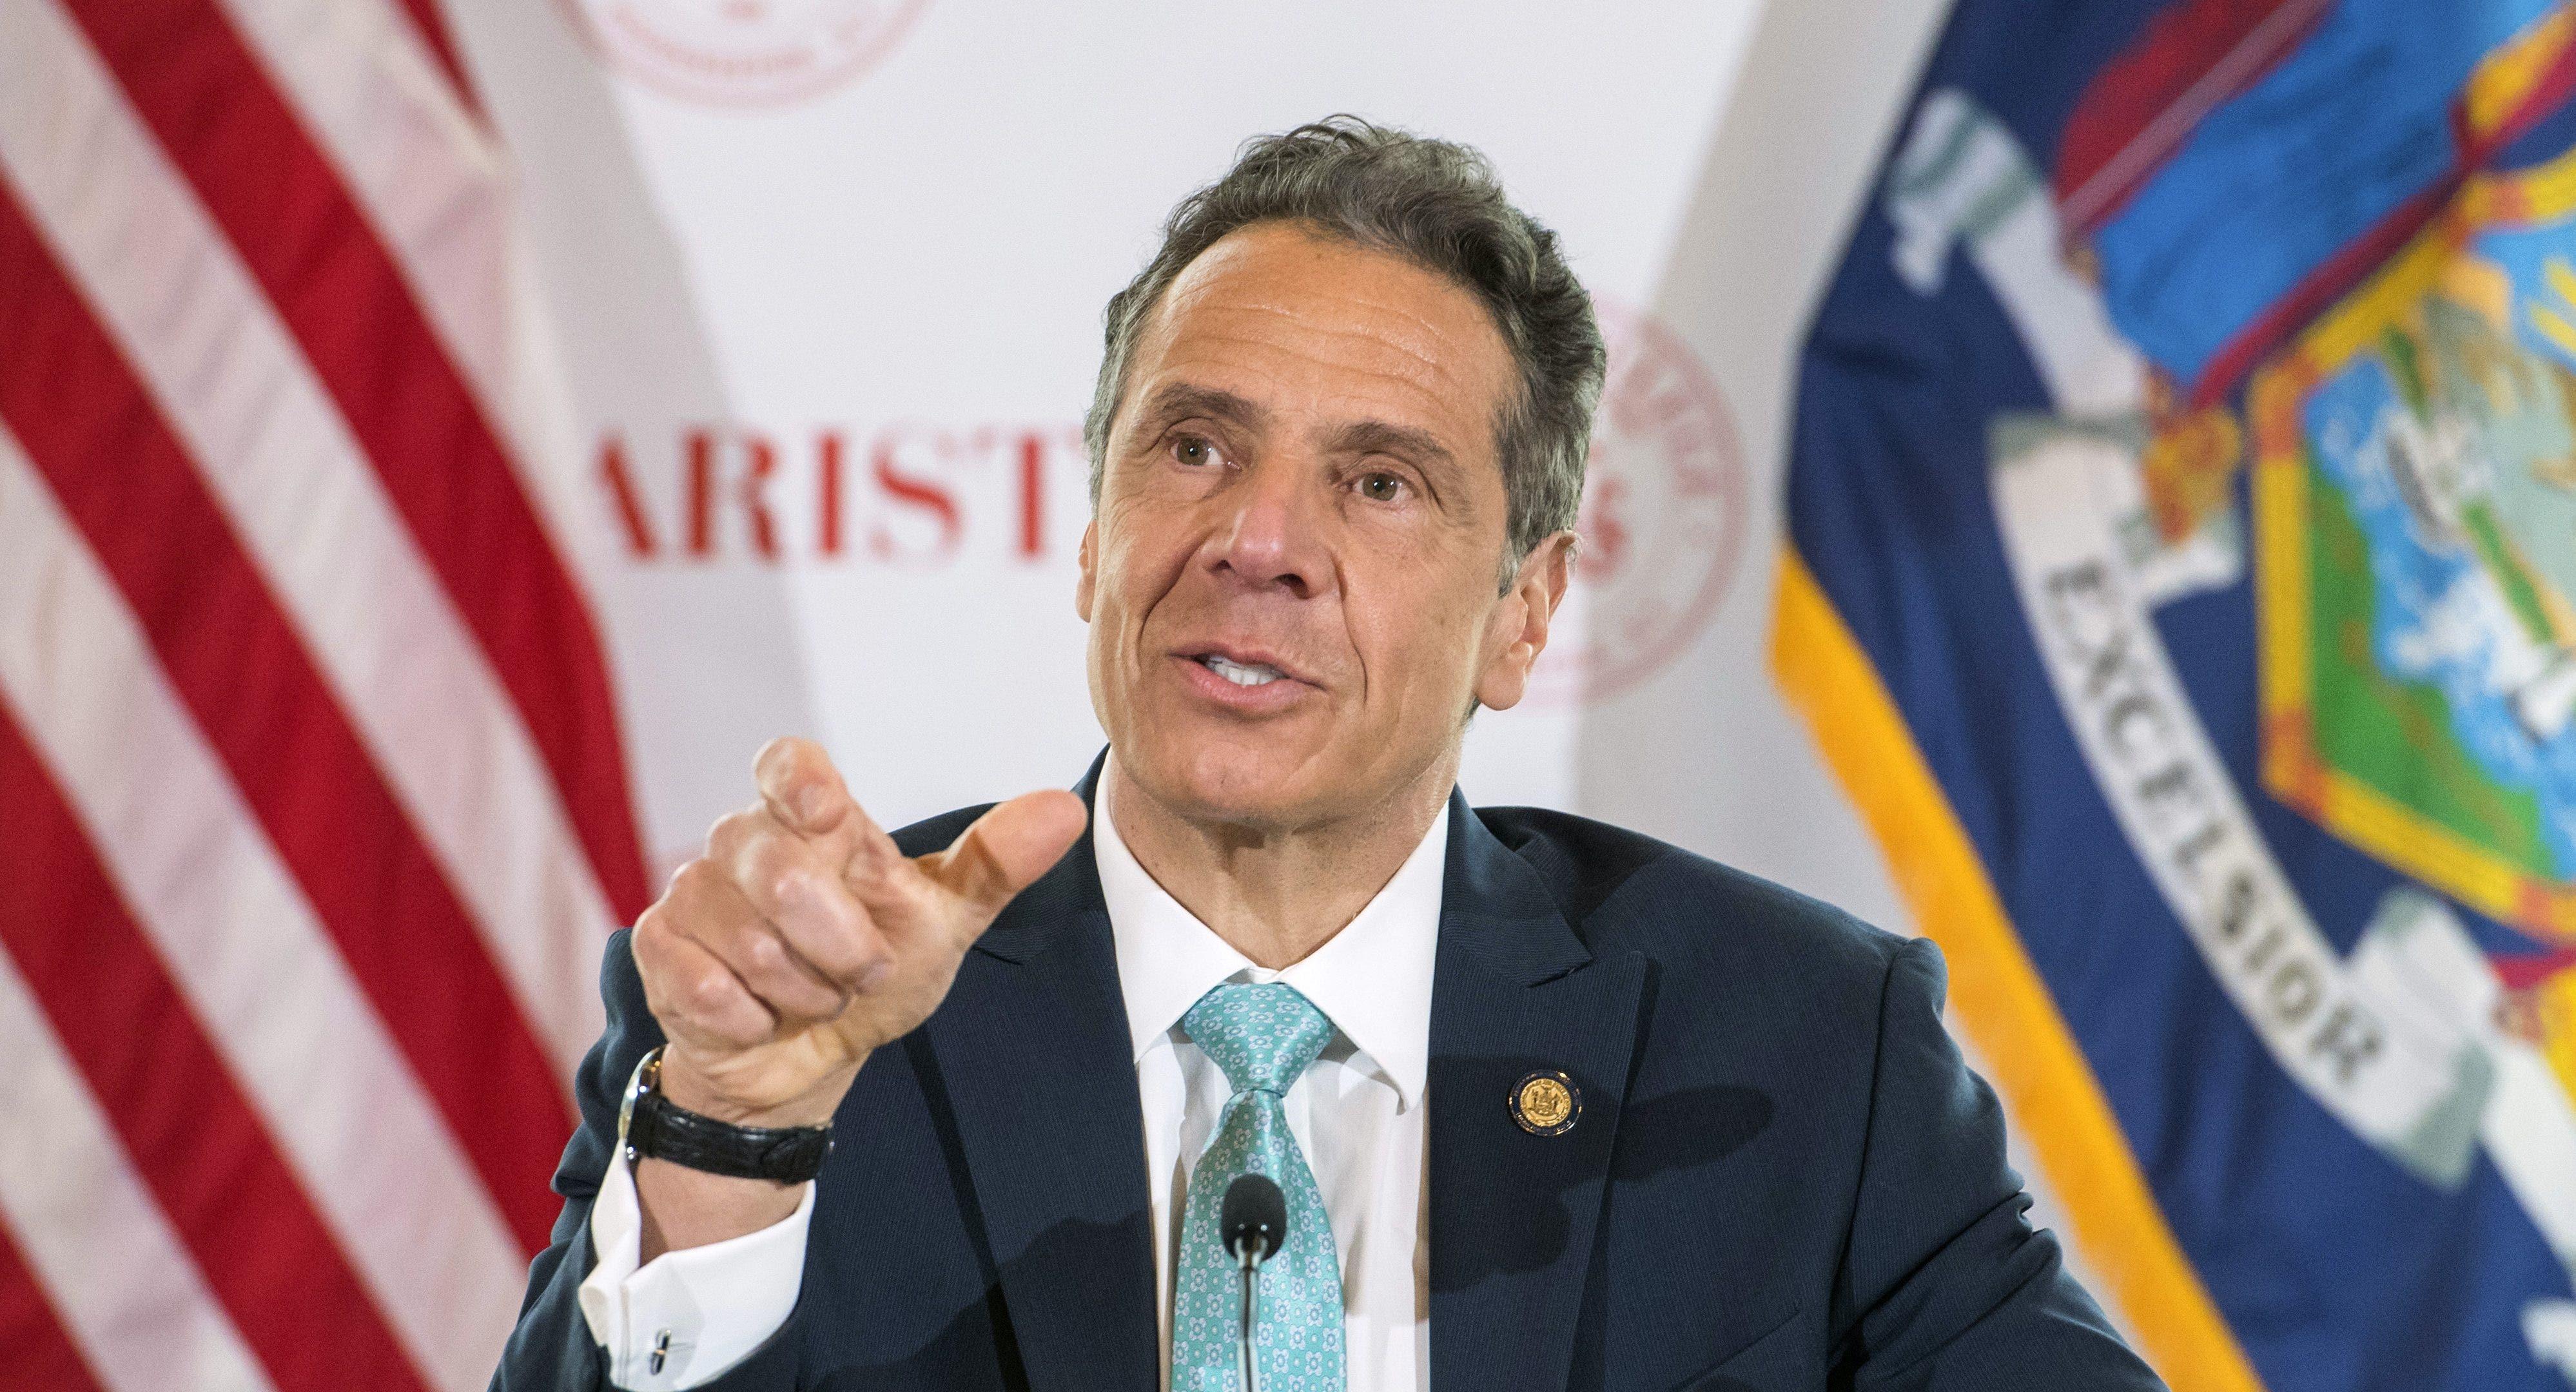 NY Gov. Cuomo revises social distancing order amid First Amendment lawsuit